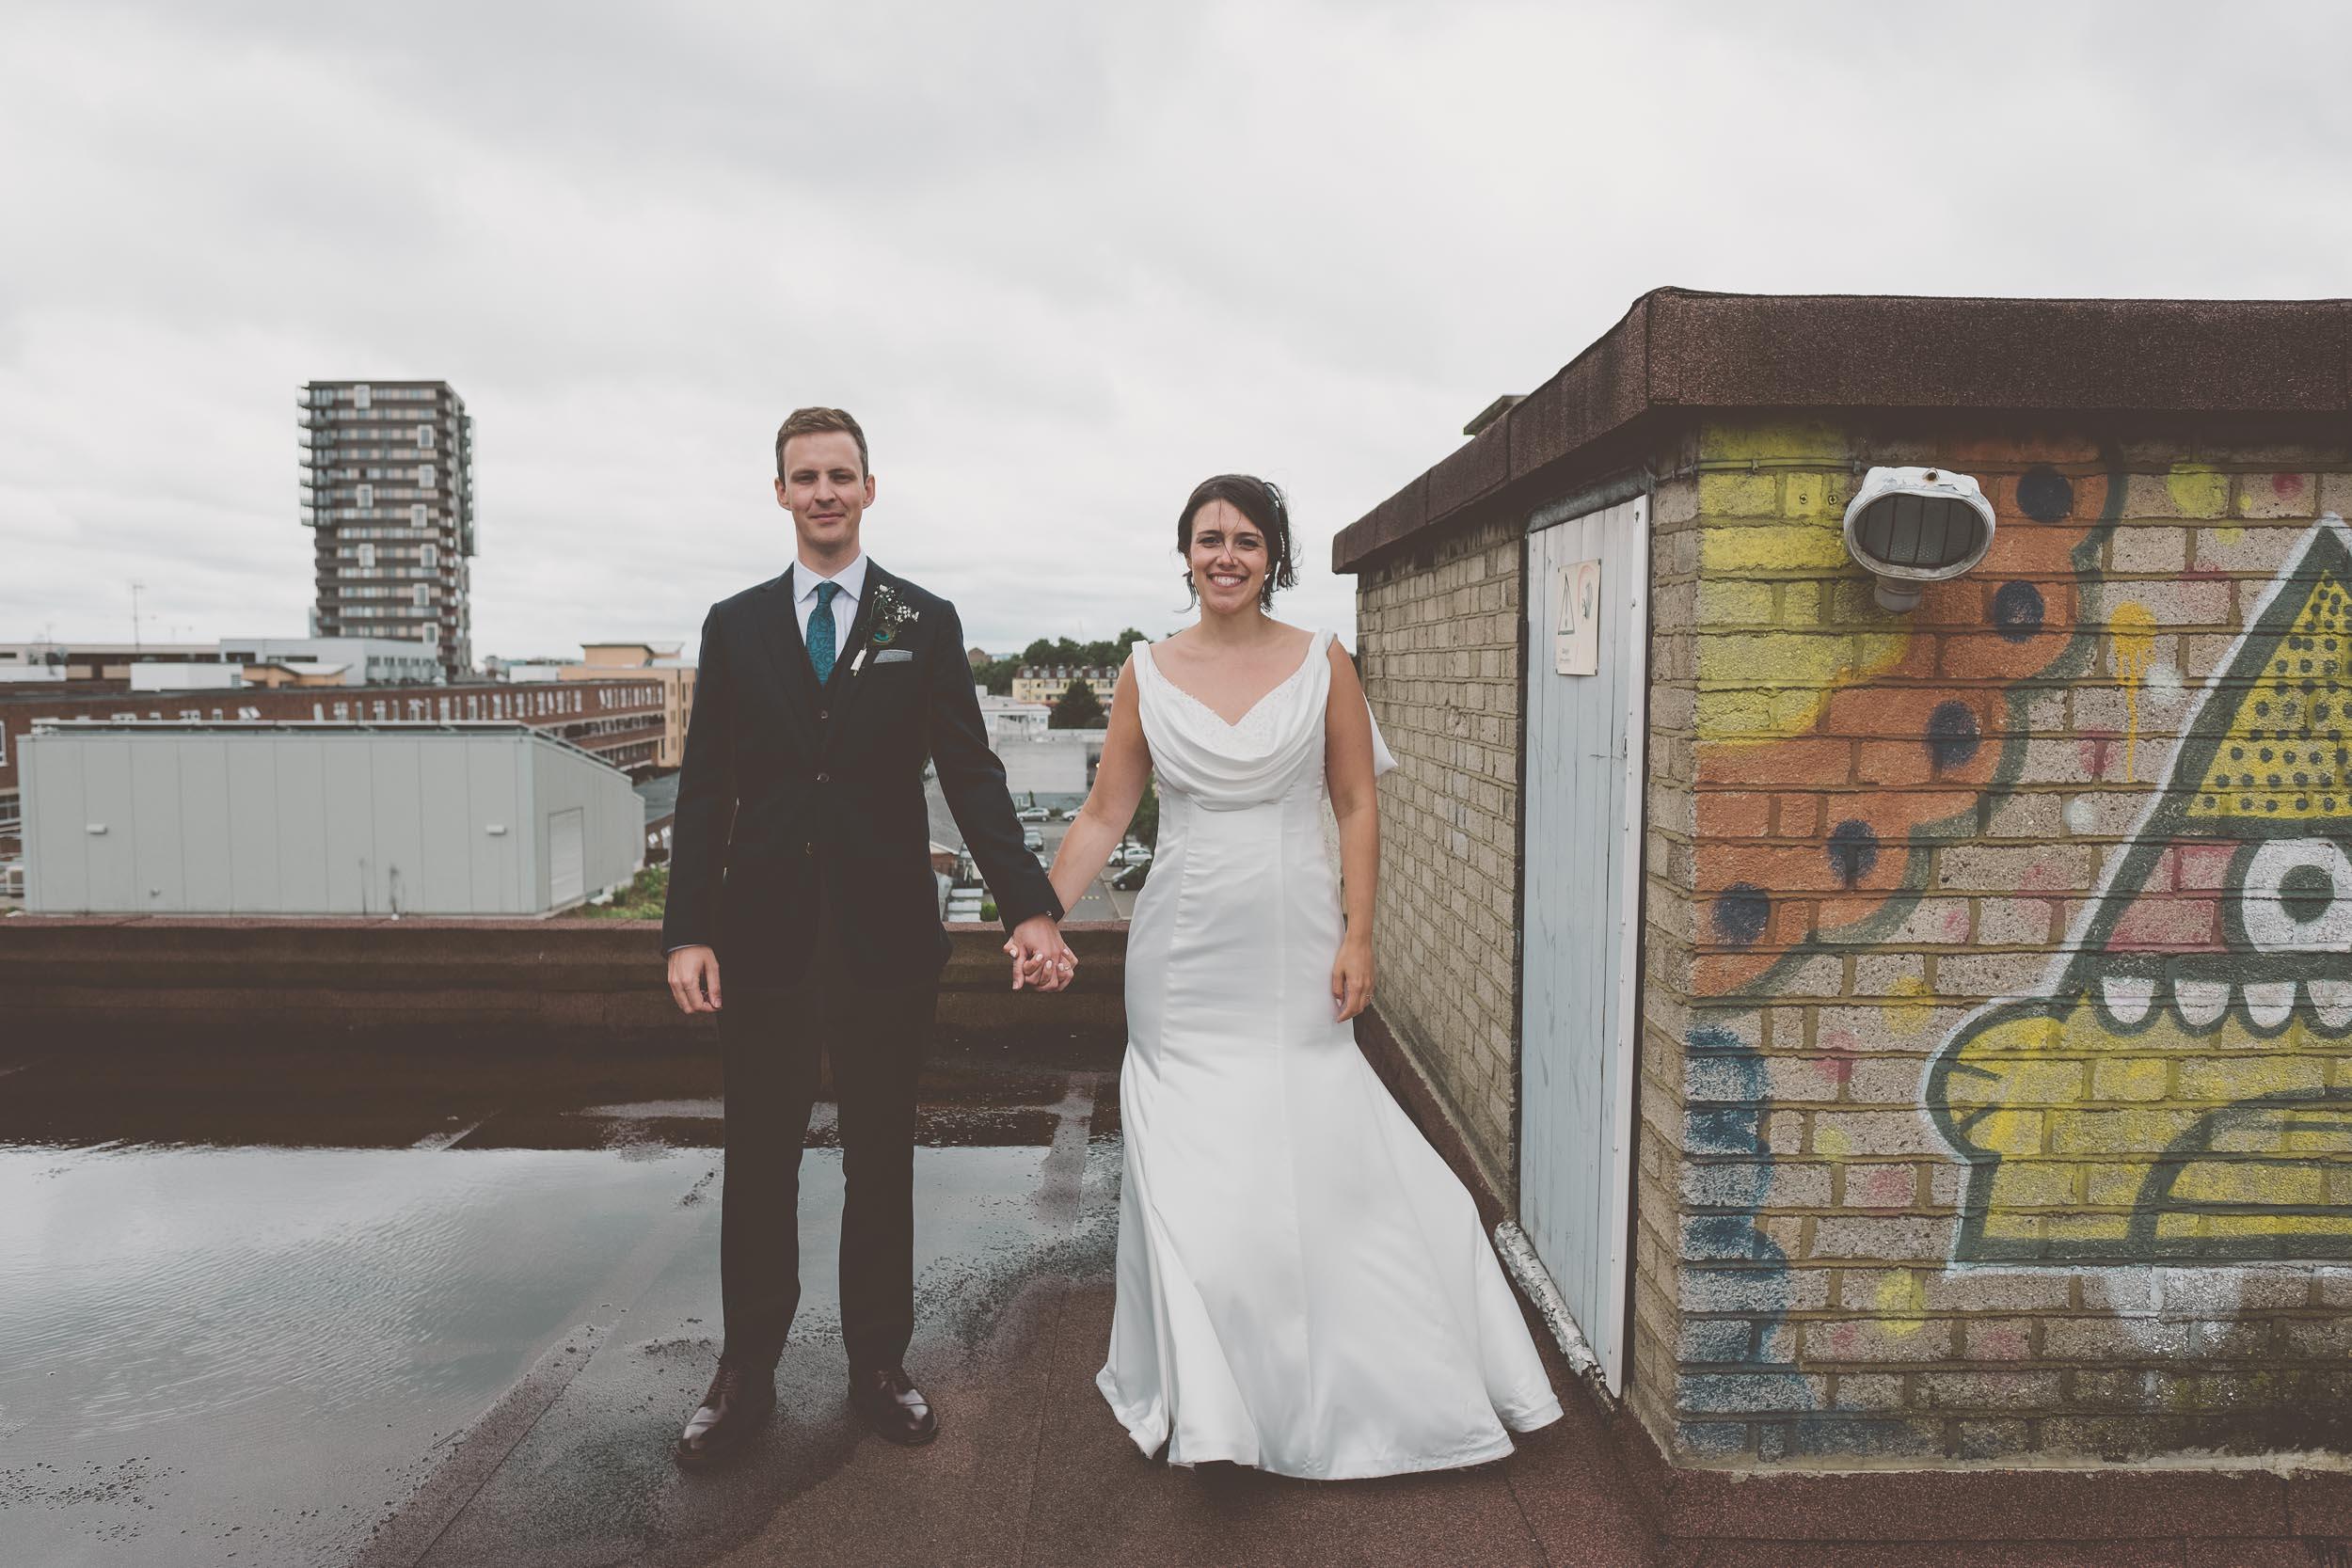 islington-town-hall-4th-floor-studios-wedding298.jpg